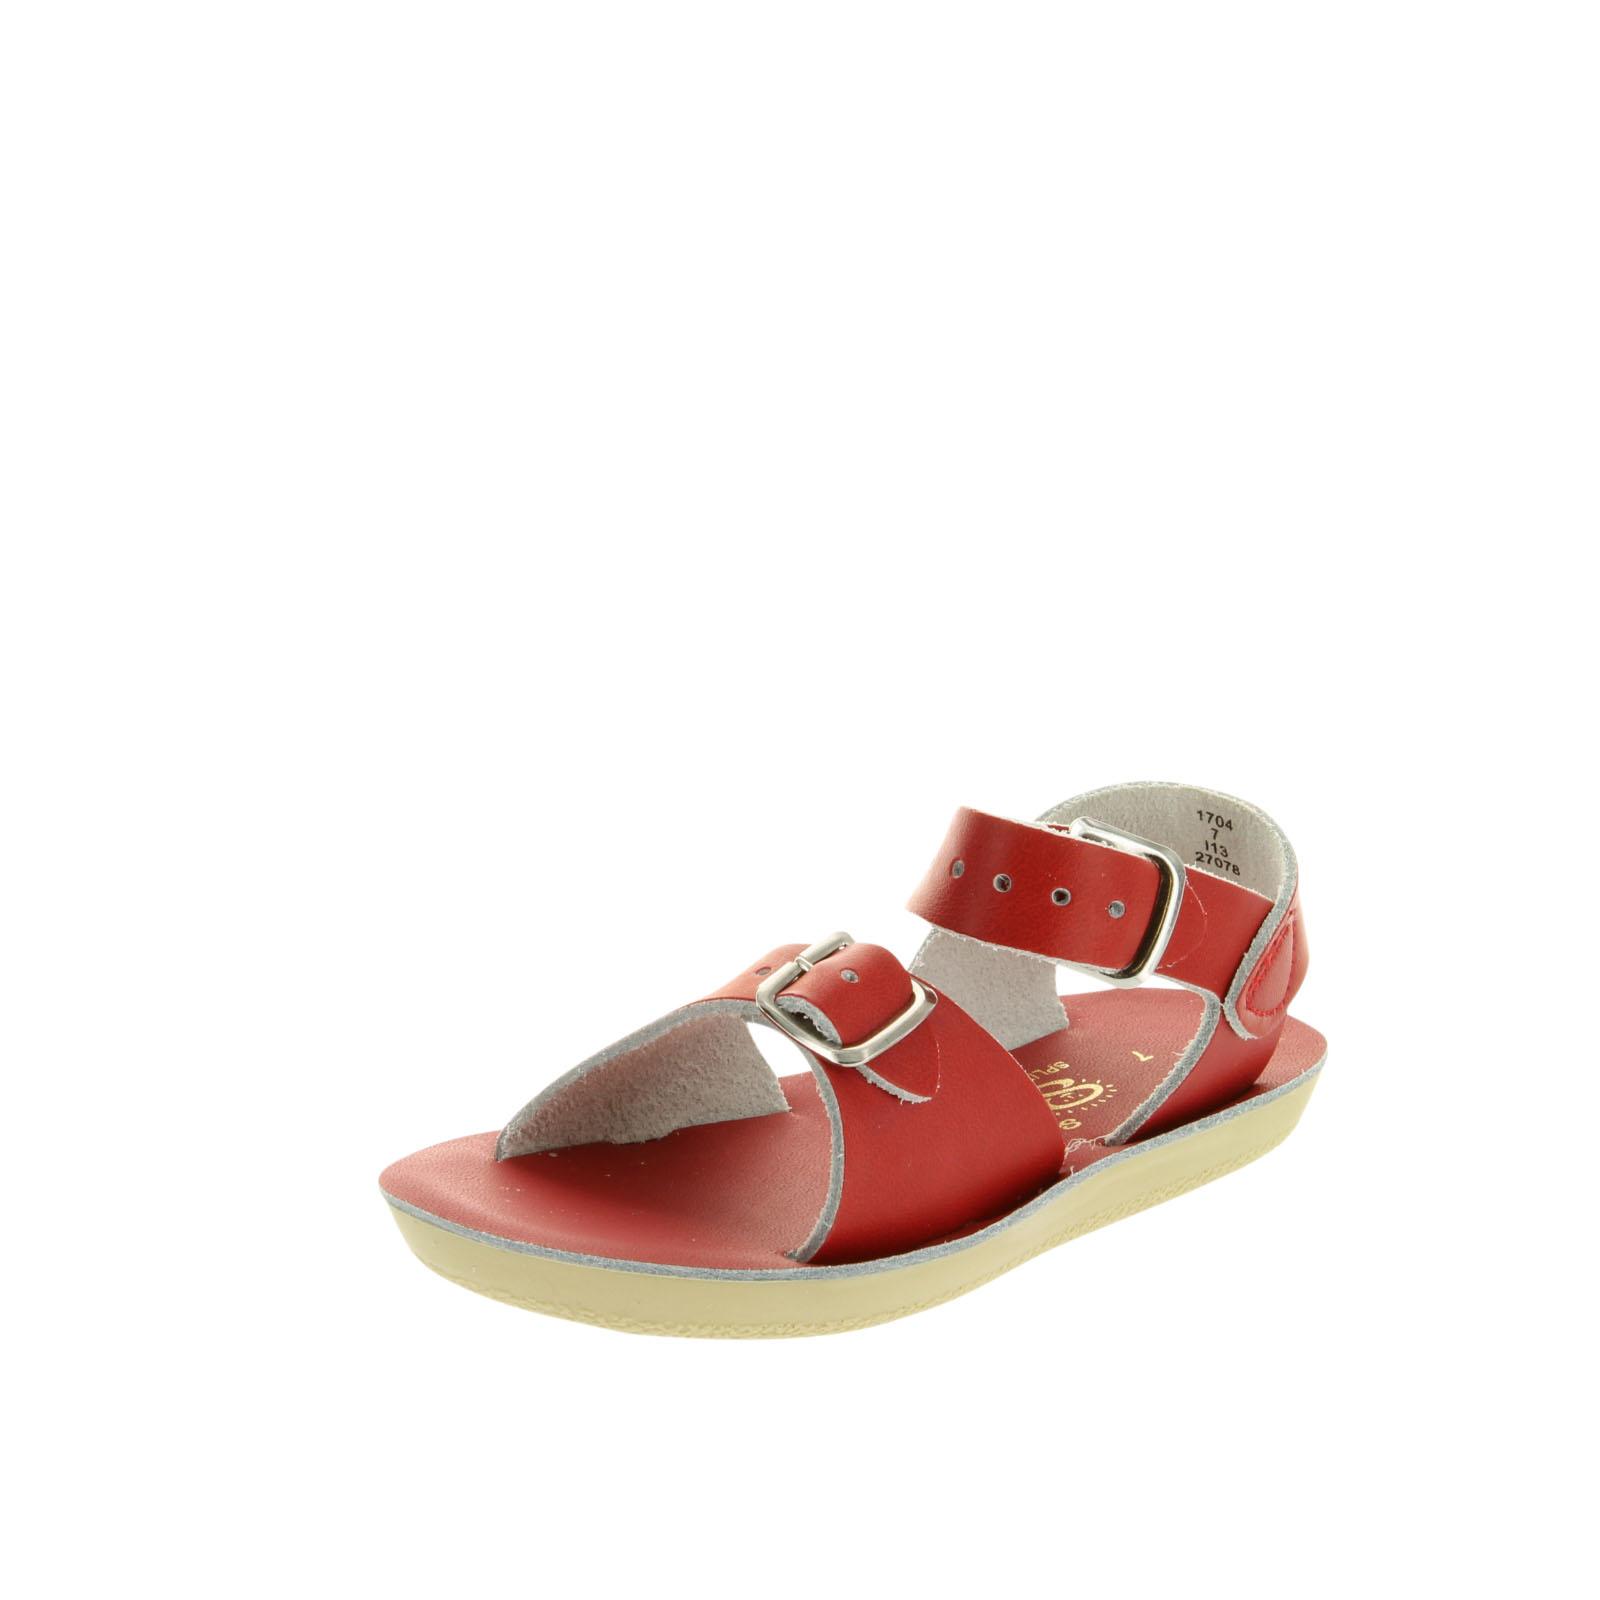 Salt Water Sandals by Hoy Shoe Sun-San Surfer